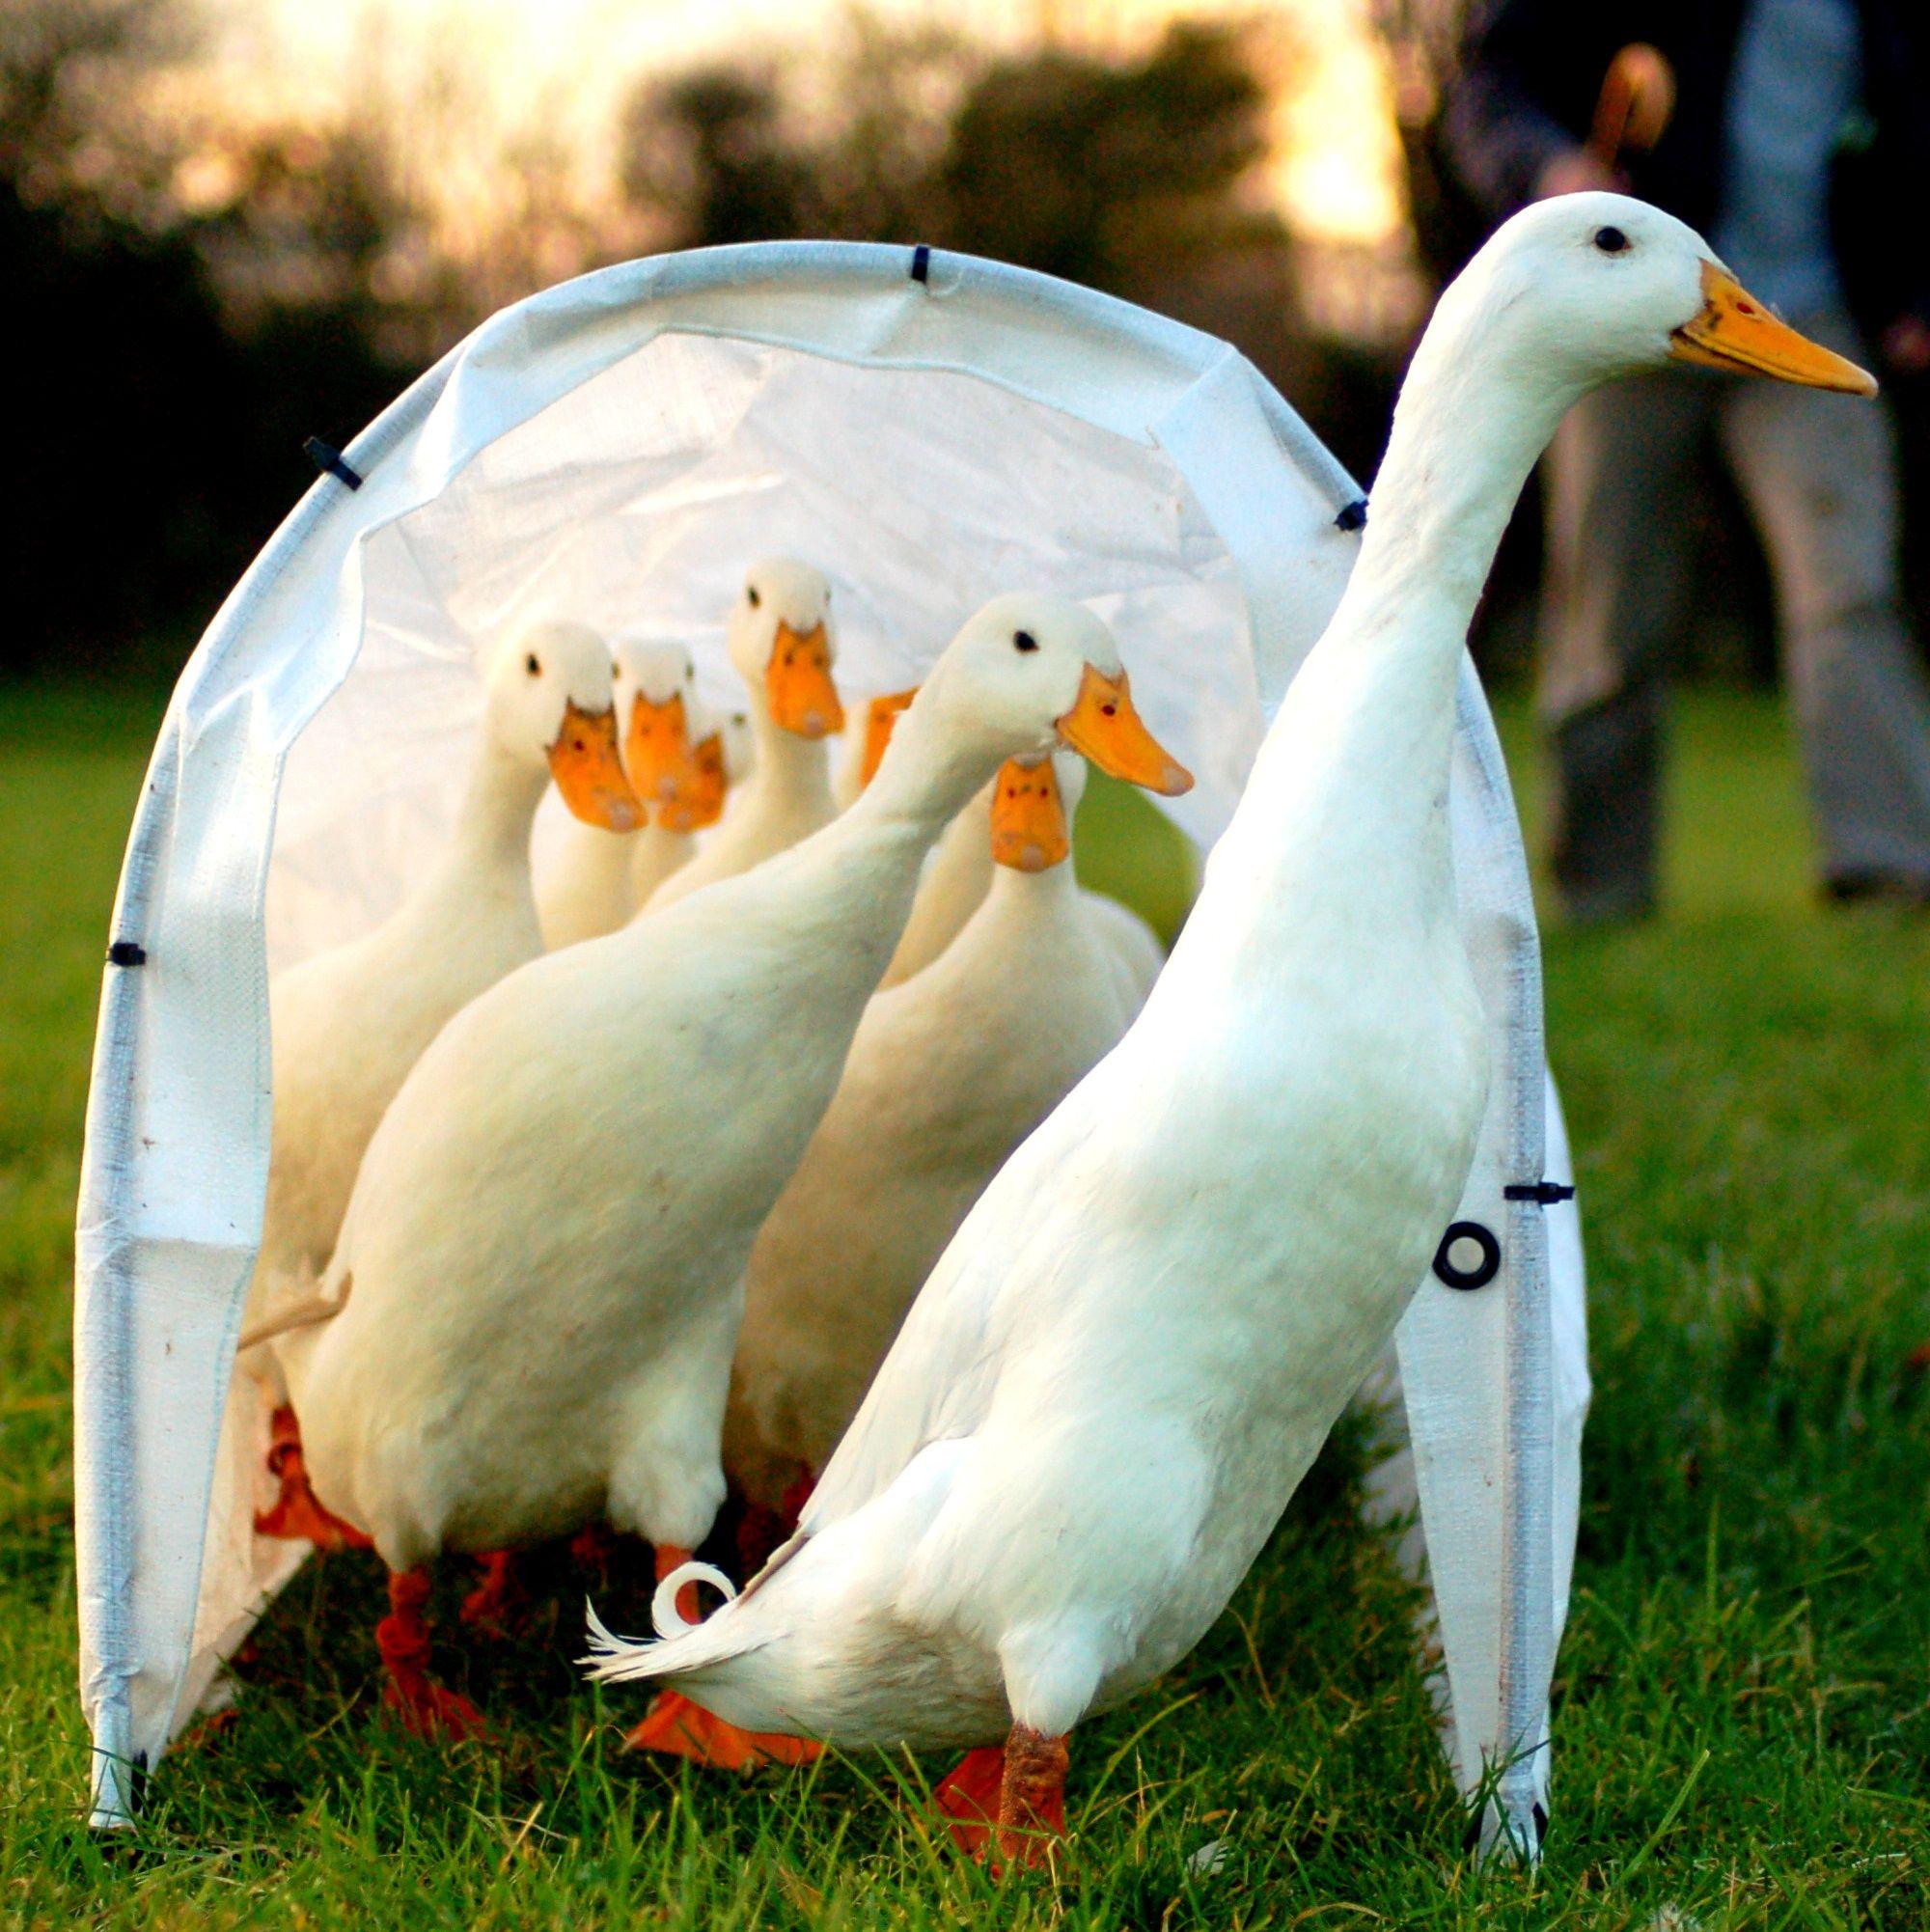 Indian Runner Ducks pictures  Google Search  Birds  turkeys